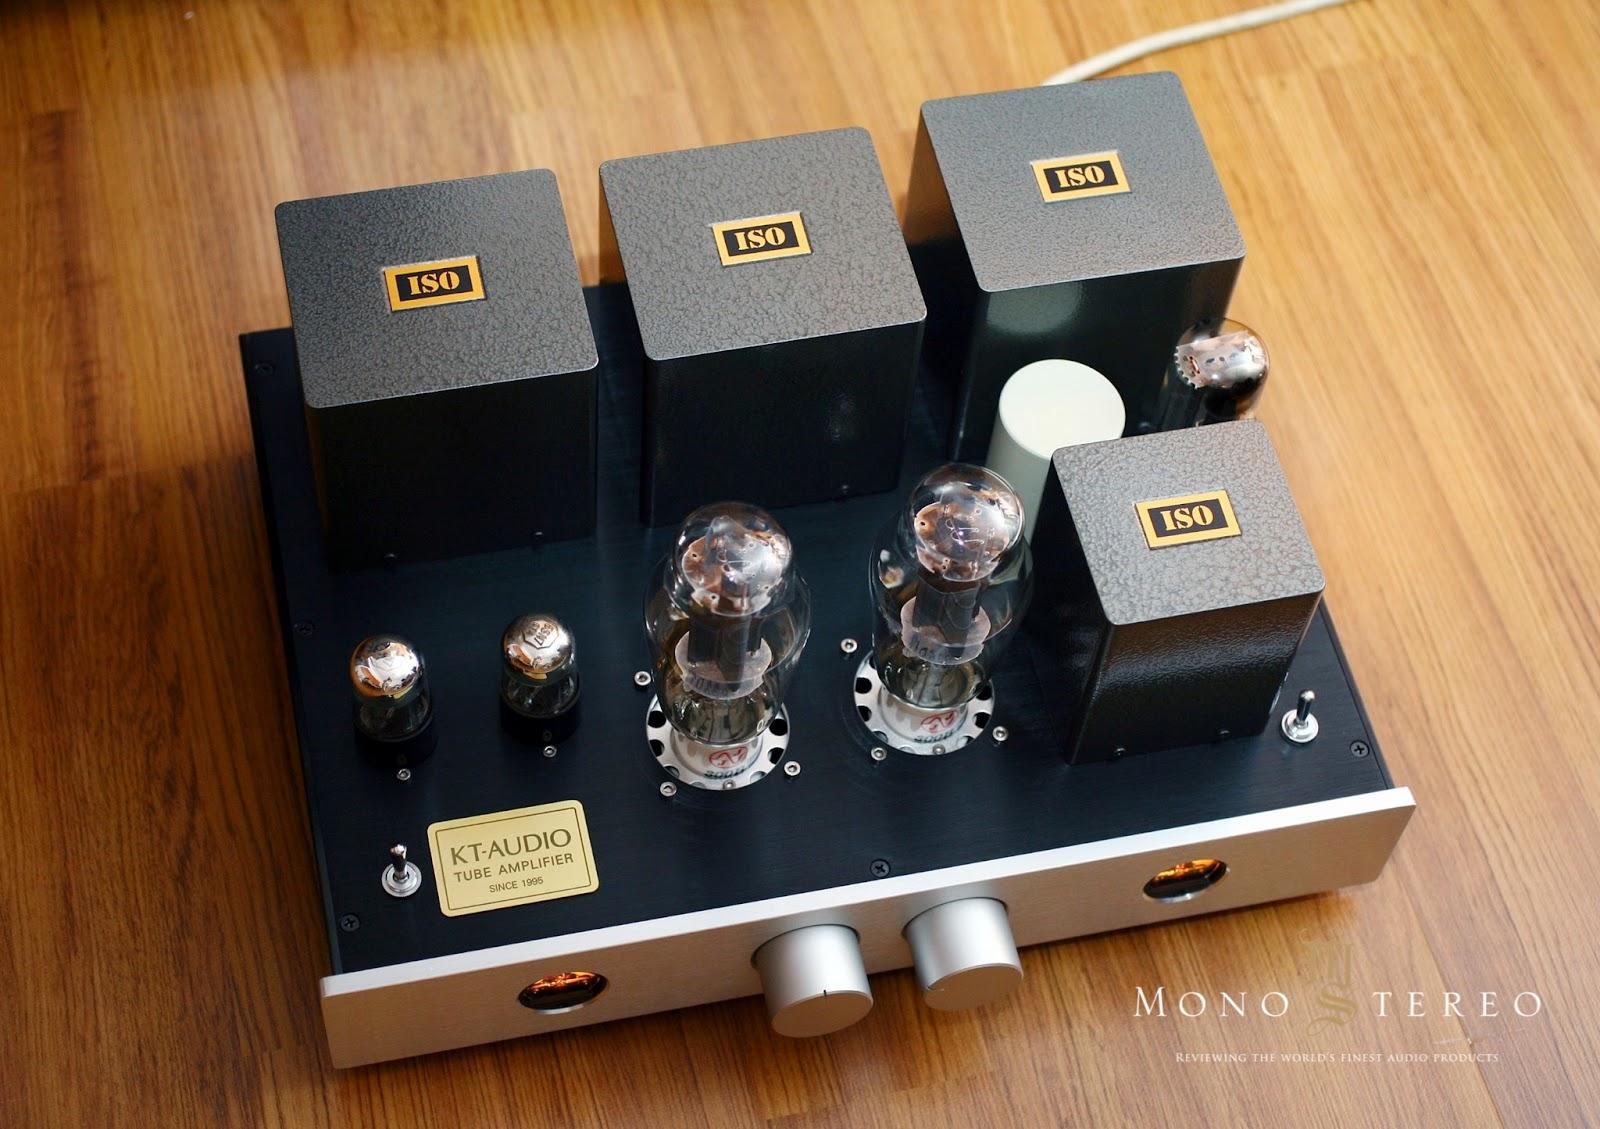 Mono and Stereo High-End Audio Magazine: KT-Audio 300B tube